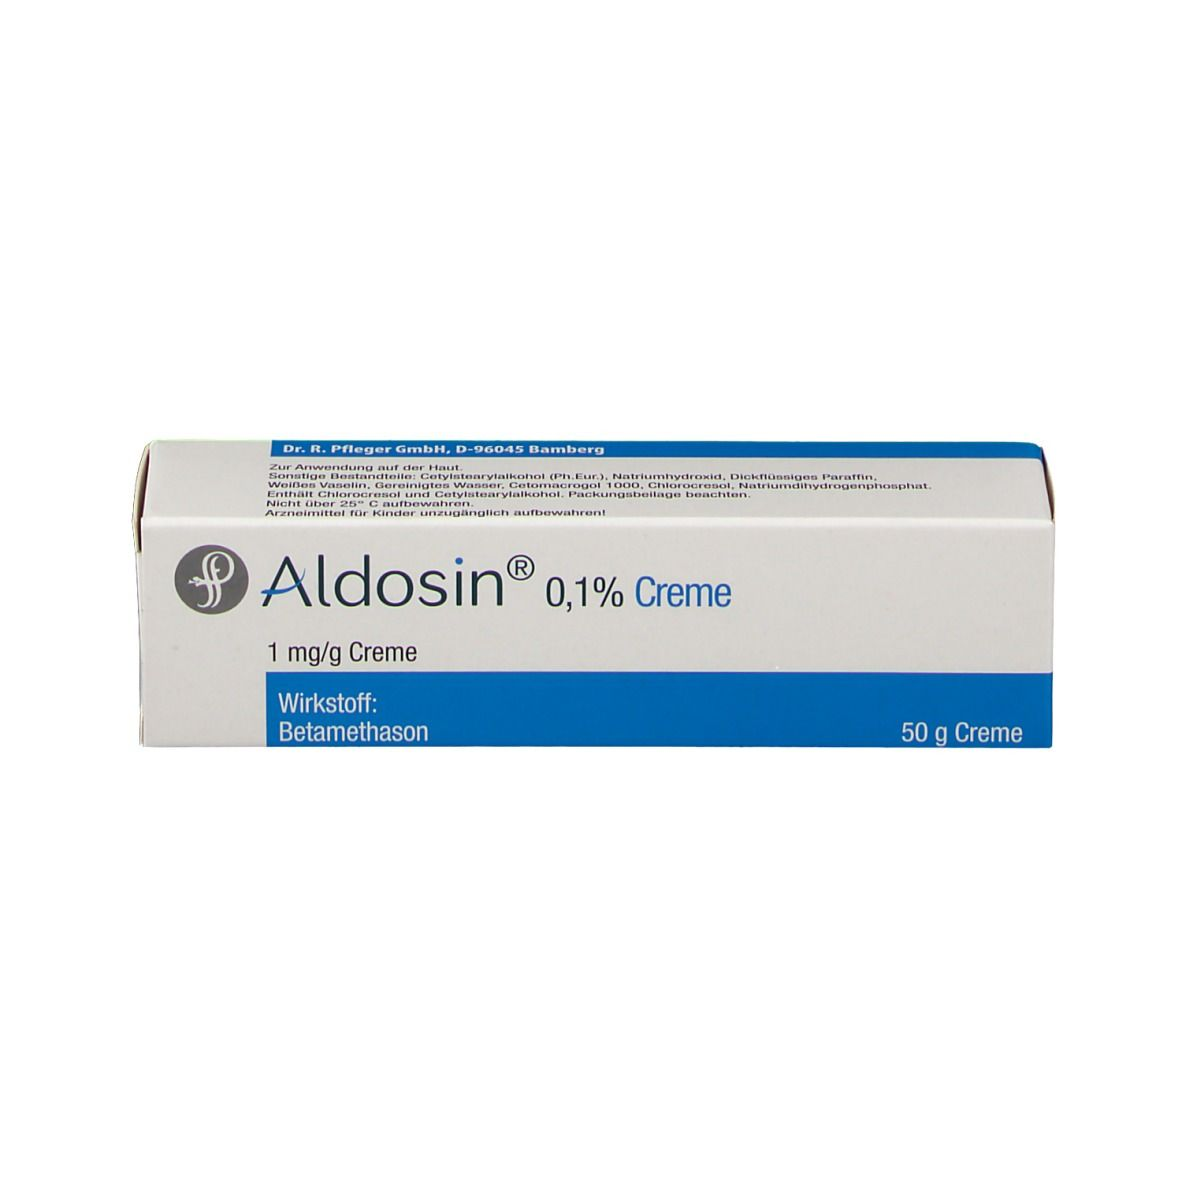 ALDOSIN 0.1% CREME